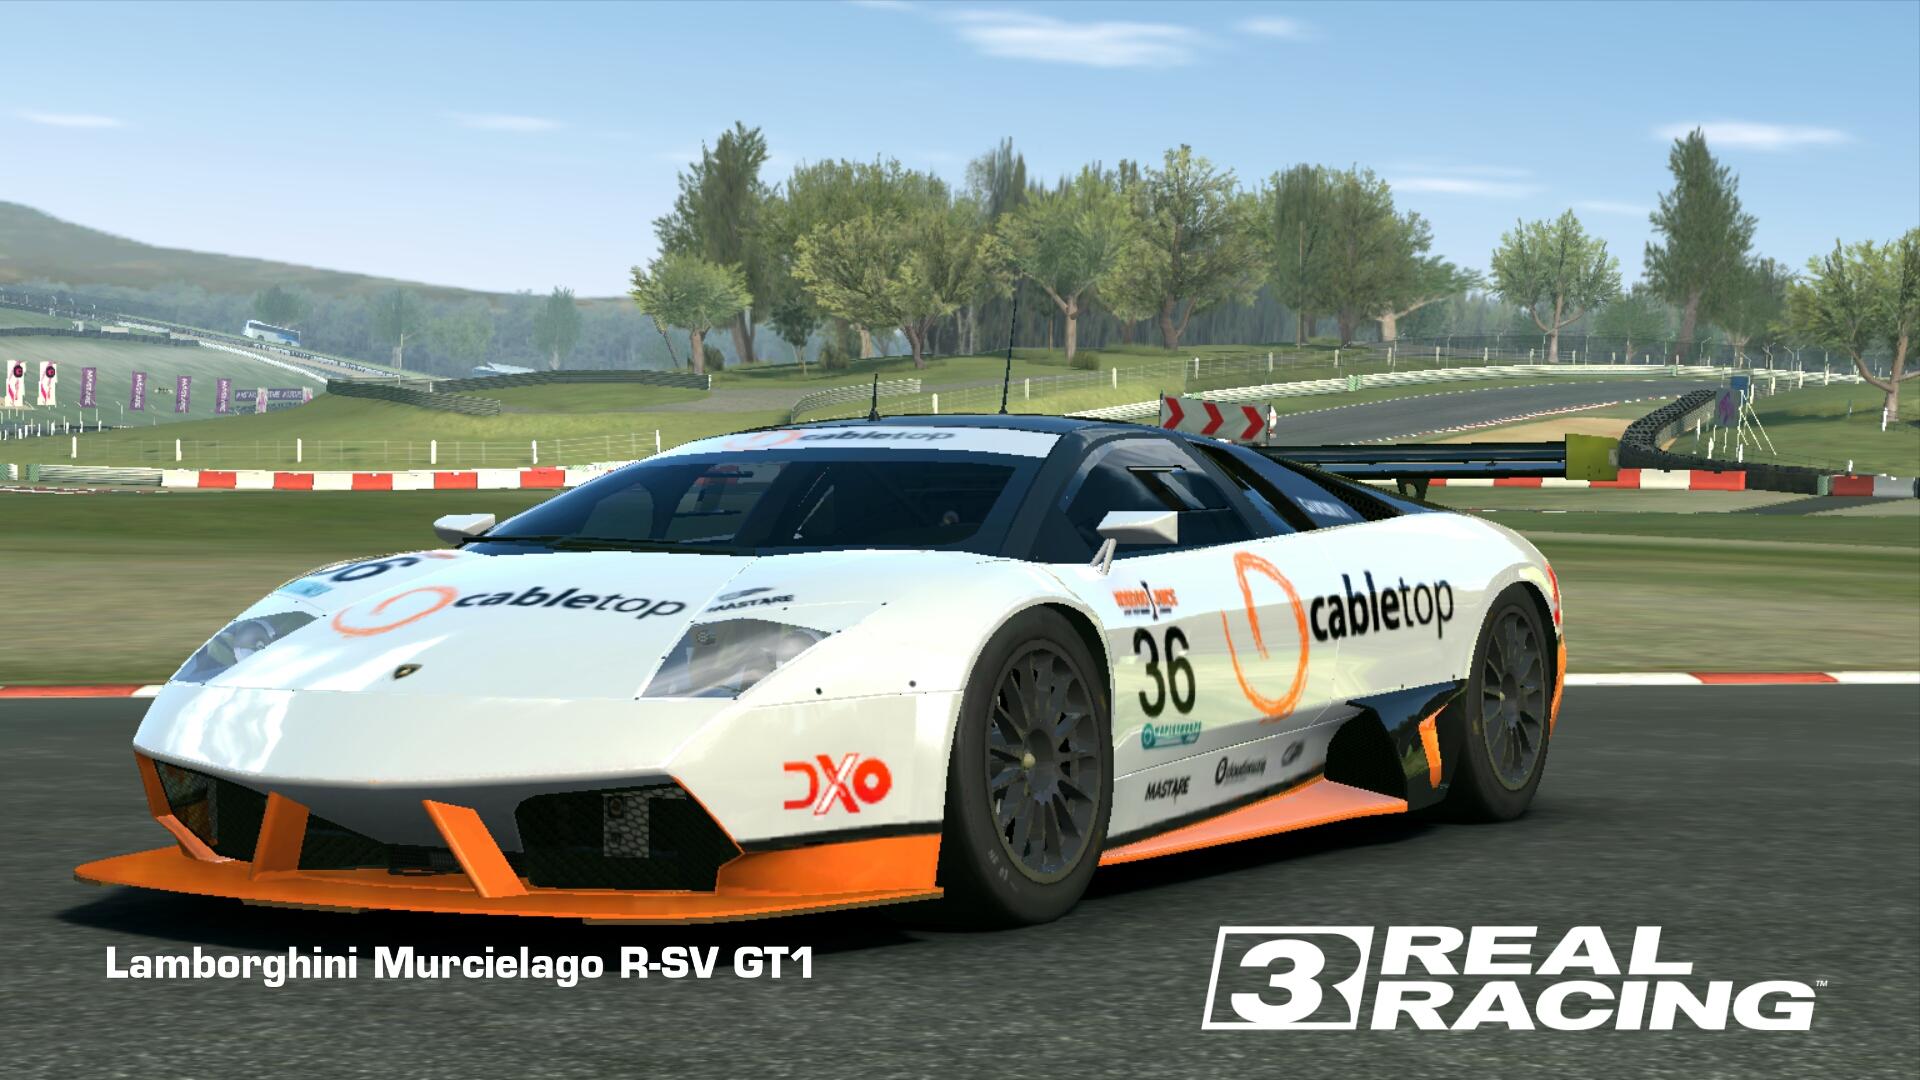 Showcase Lamborghini Murcielago R-SV GT1